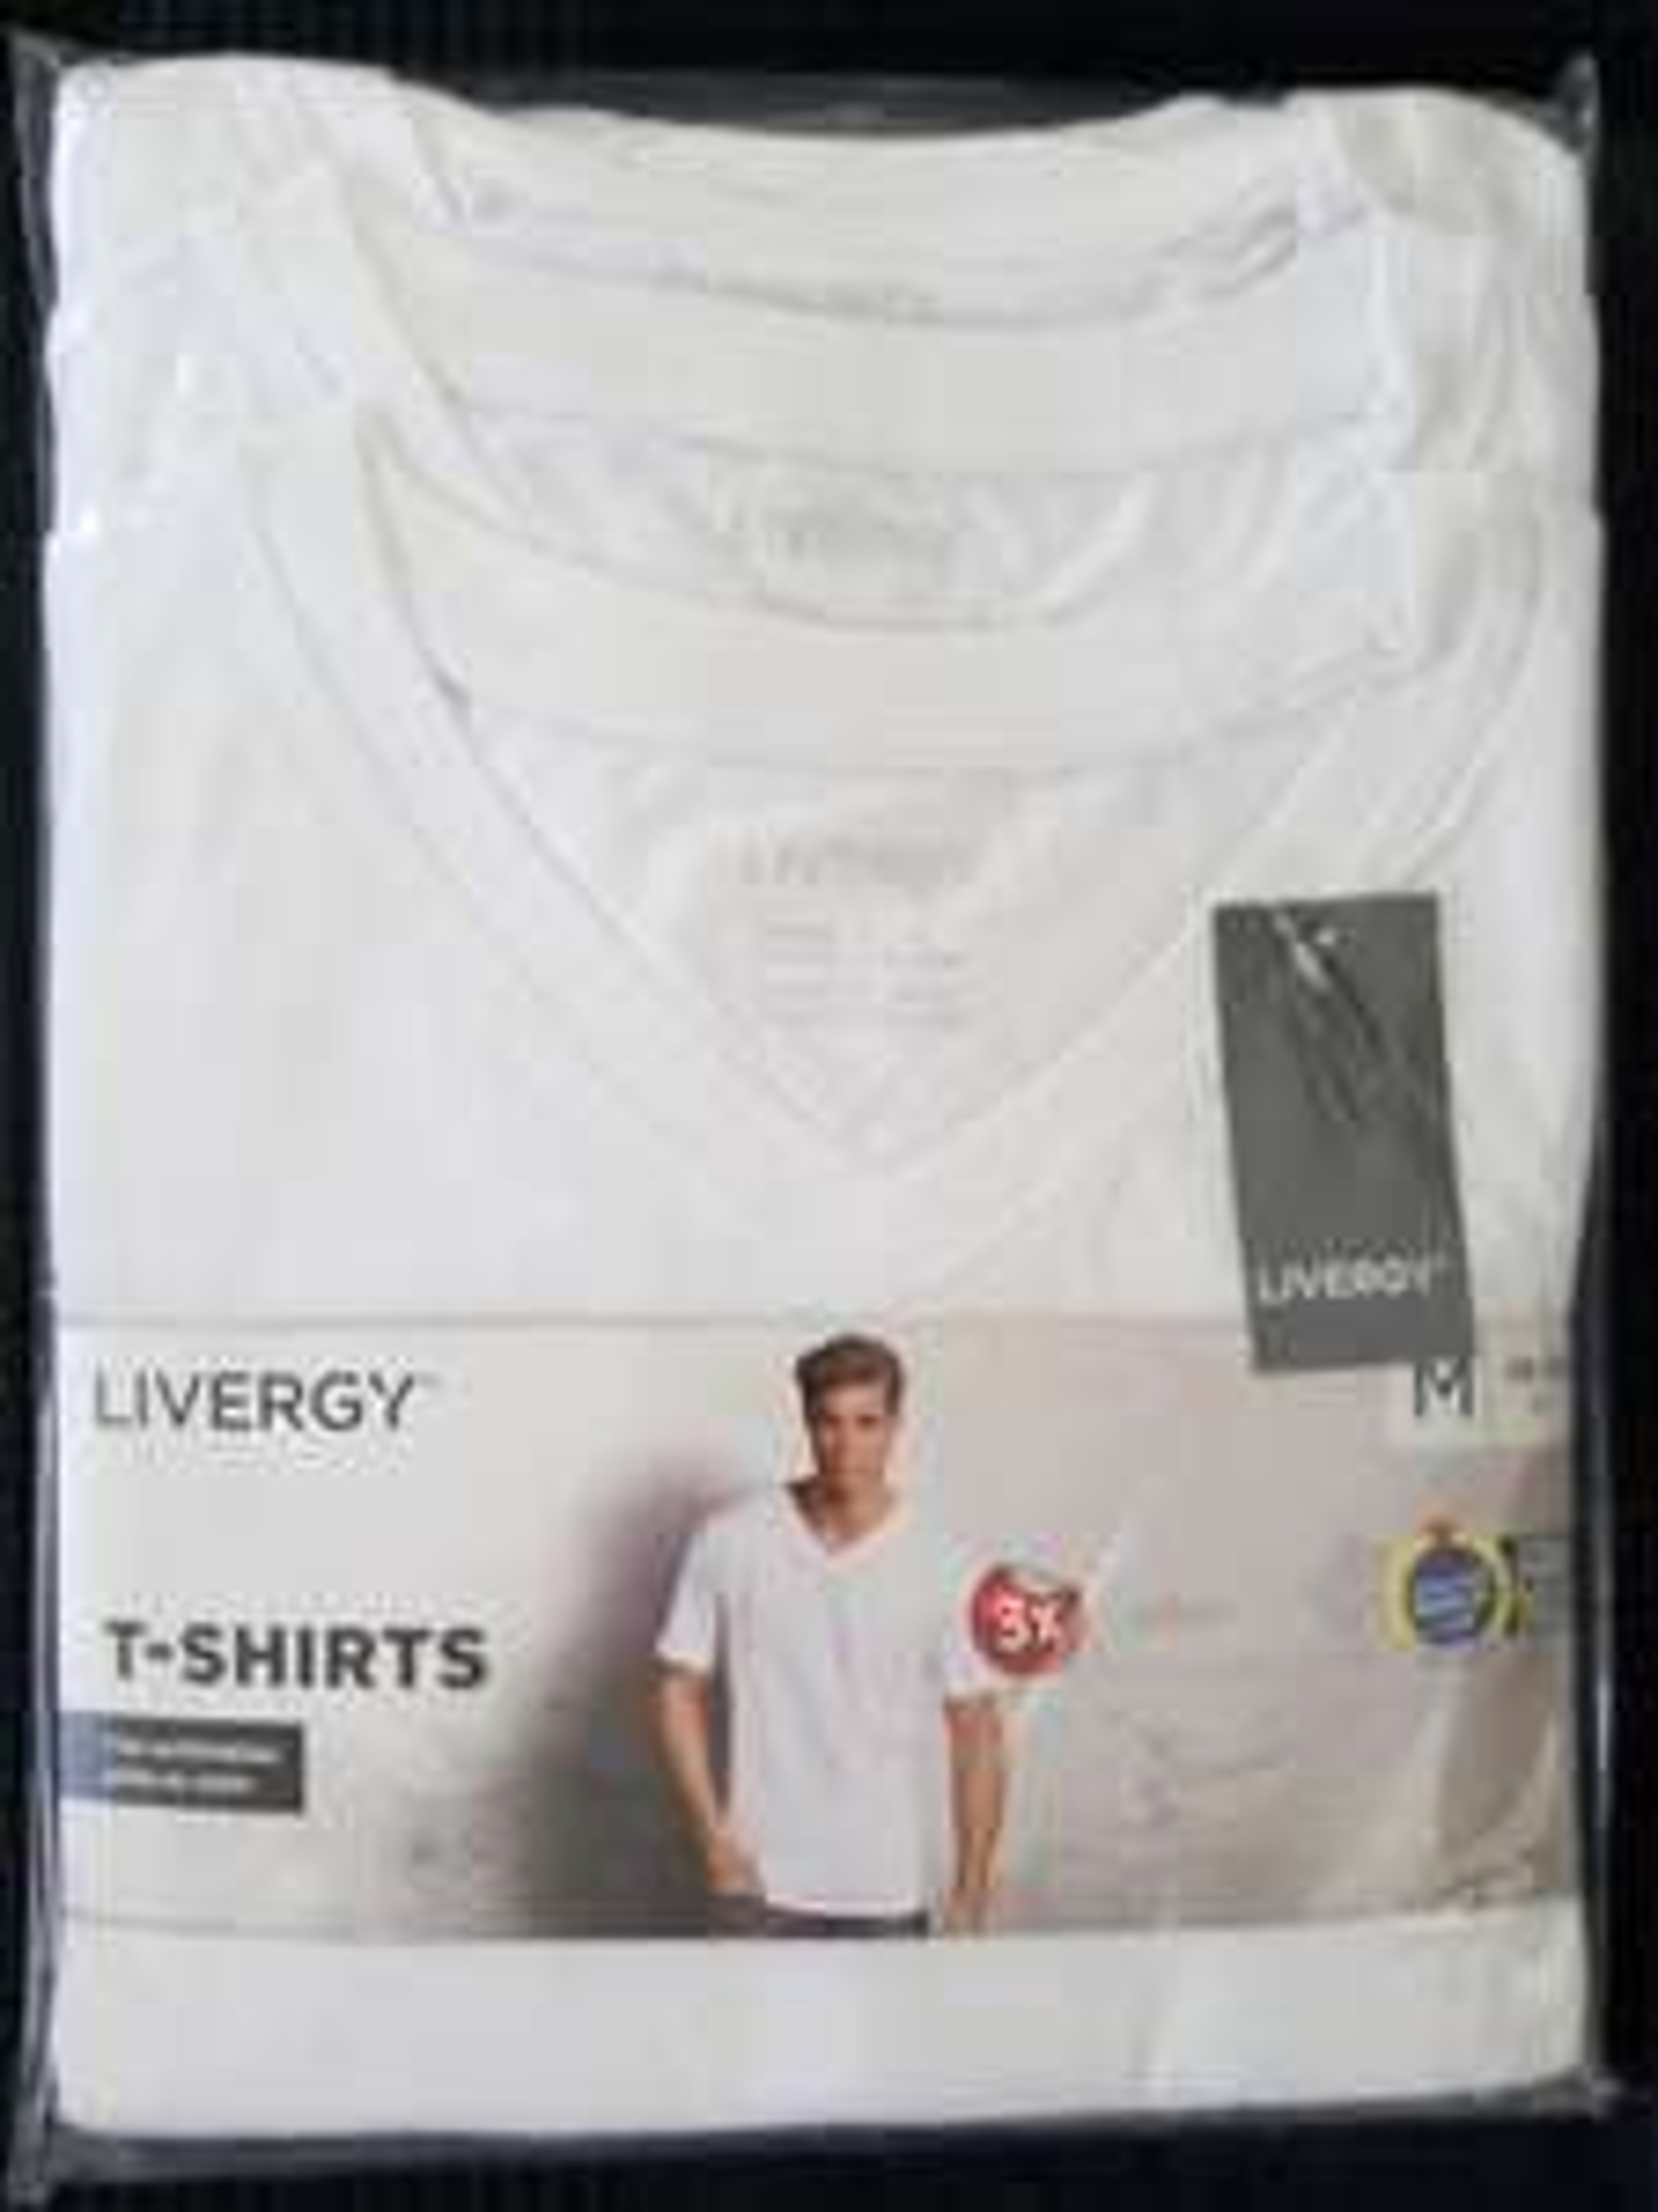 Lot de 3 T-shirts col V Livergy - Blanc ou noir, 100% coton